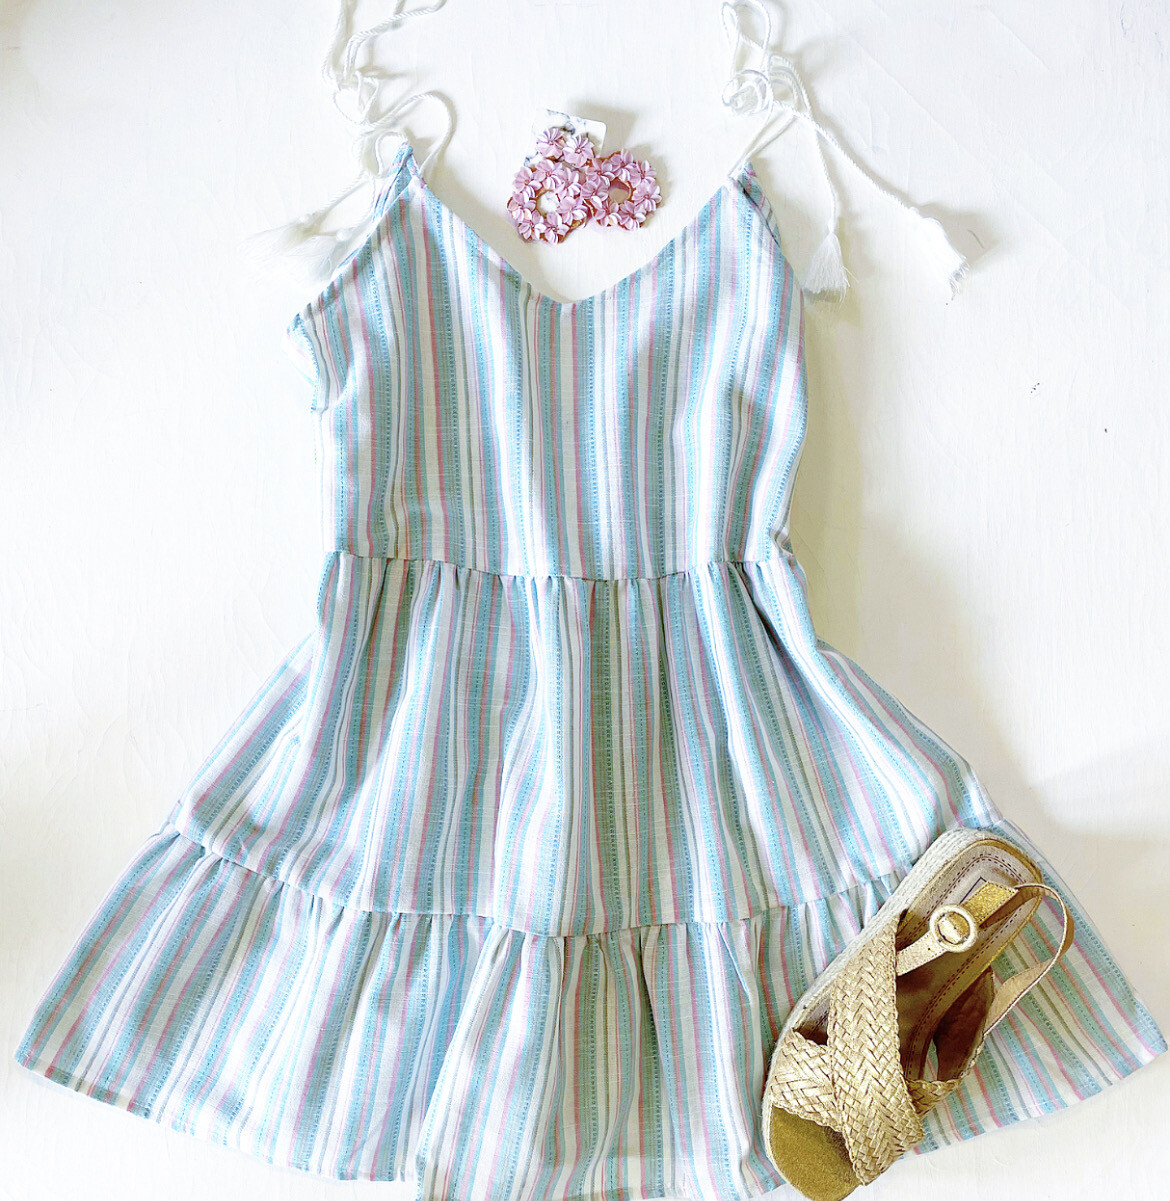 Mint and Mauve Pinstripe Dress